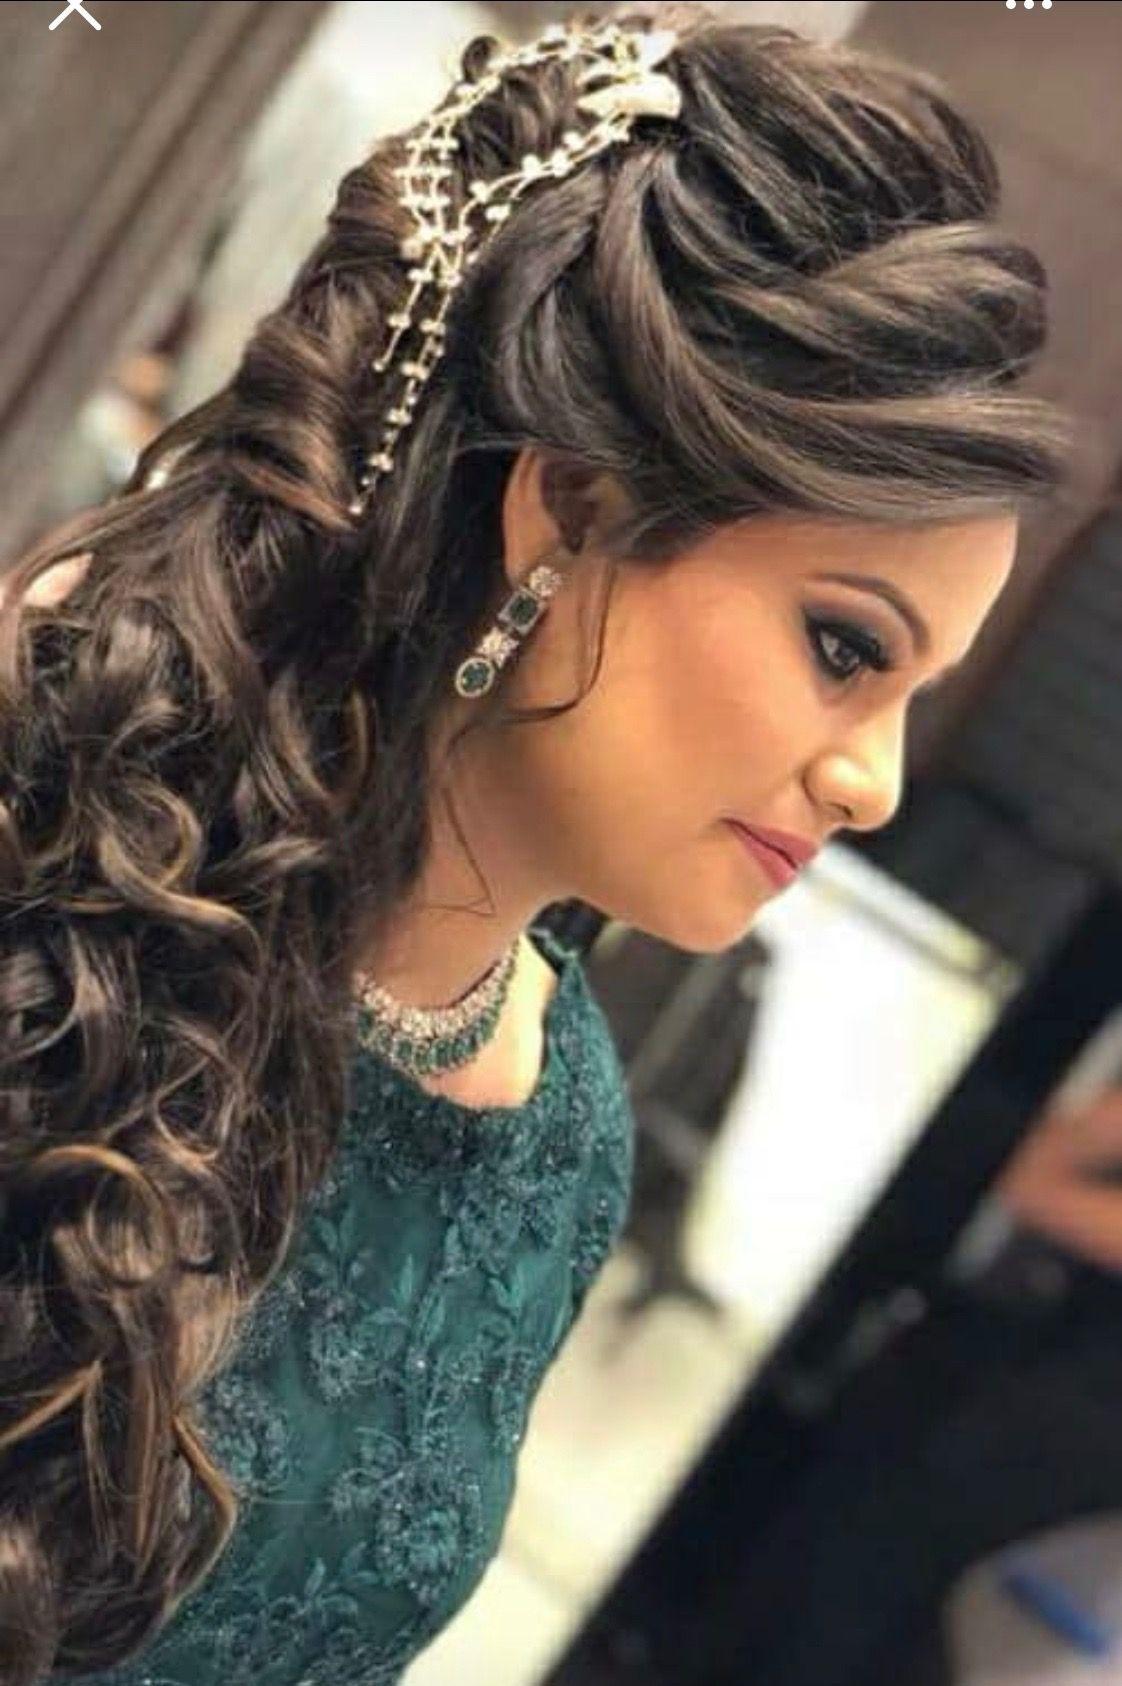 hair stile | hair styles in 2019 | long hair styles, front